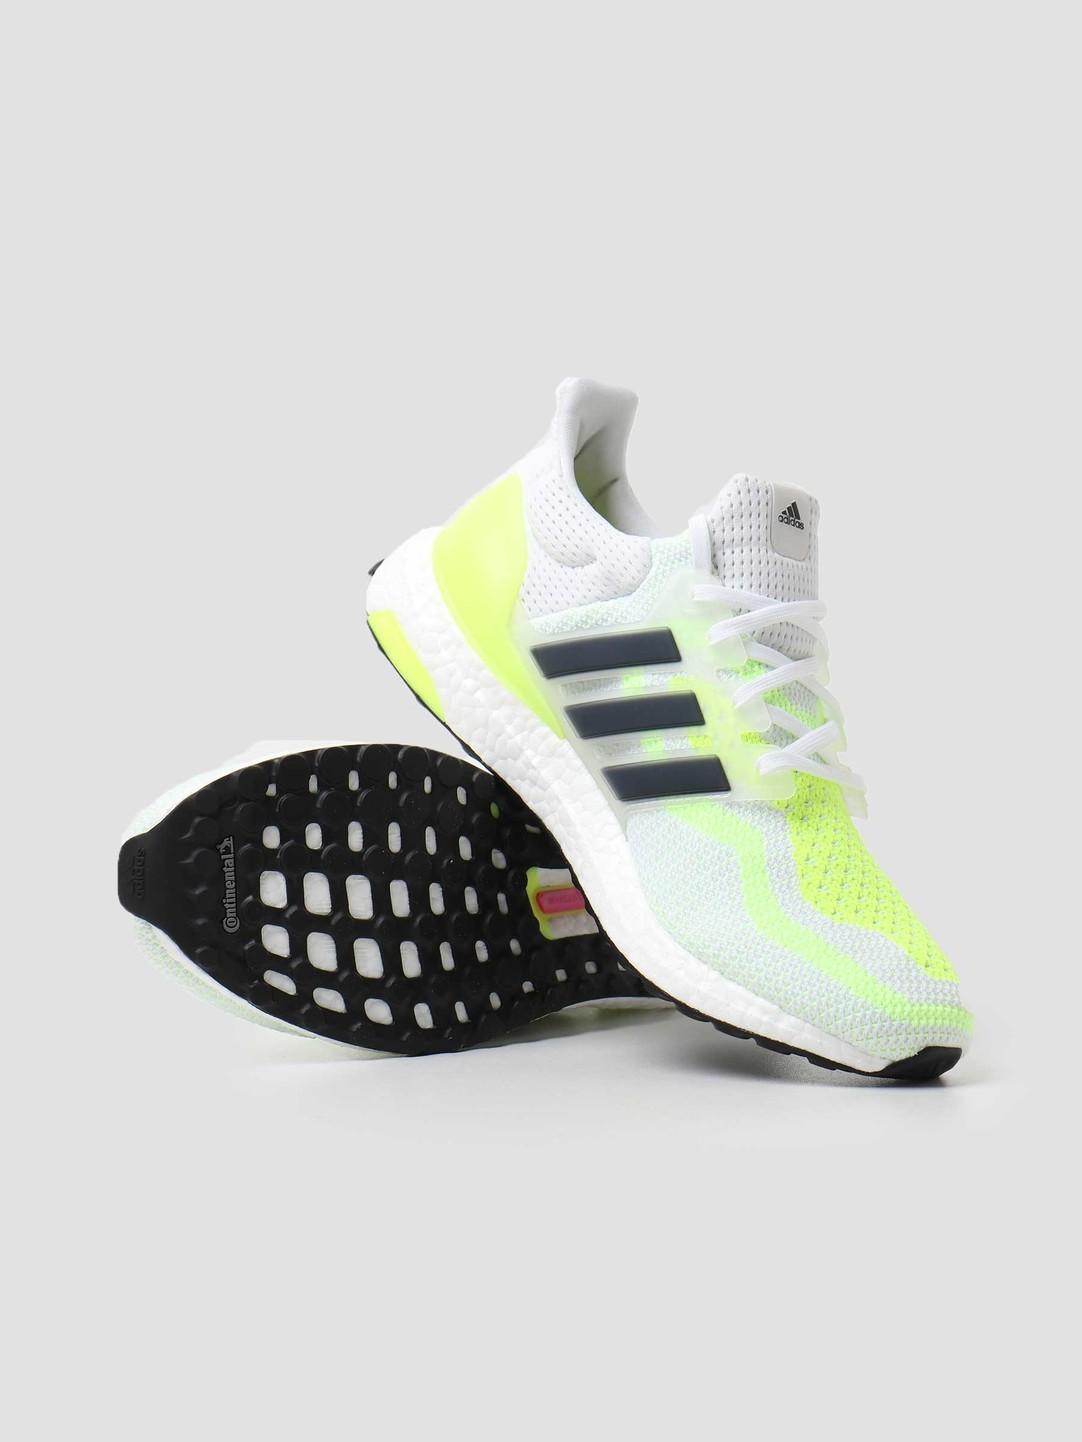 adidas adidas Ultraboost 2.0 DNA Footwear White Coreblack Solar Yellow